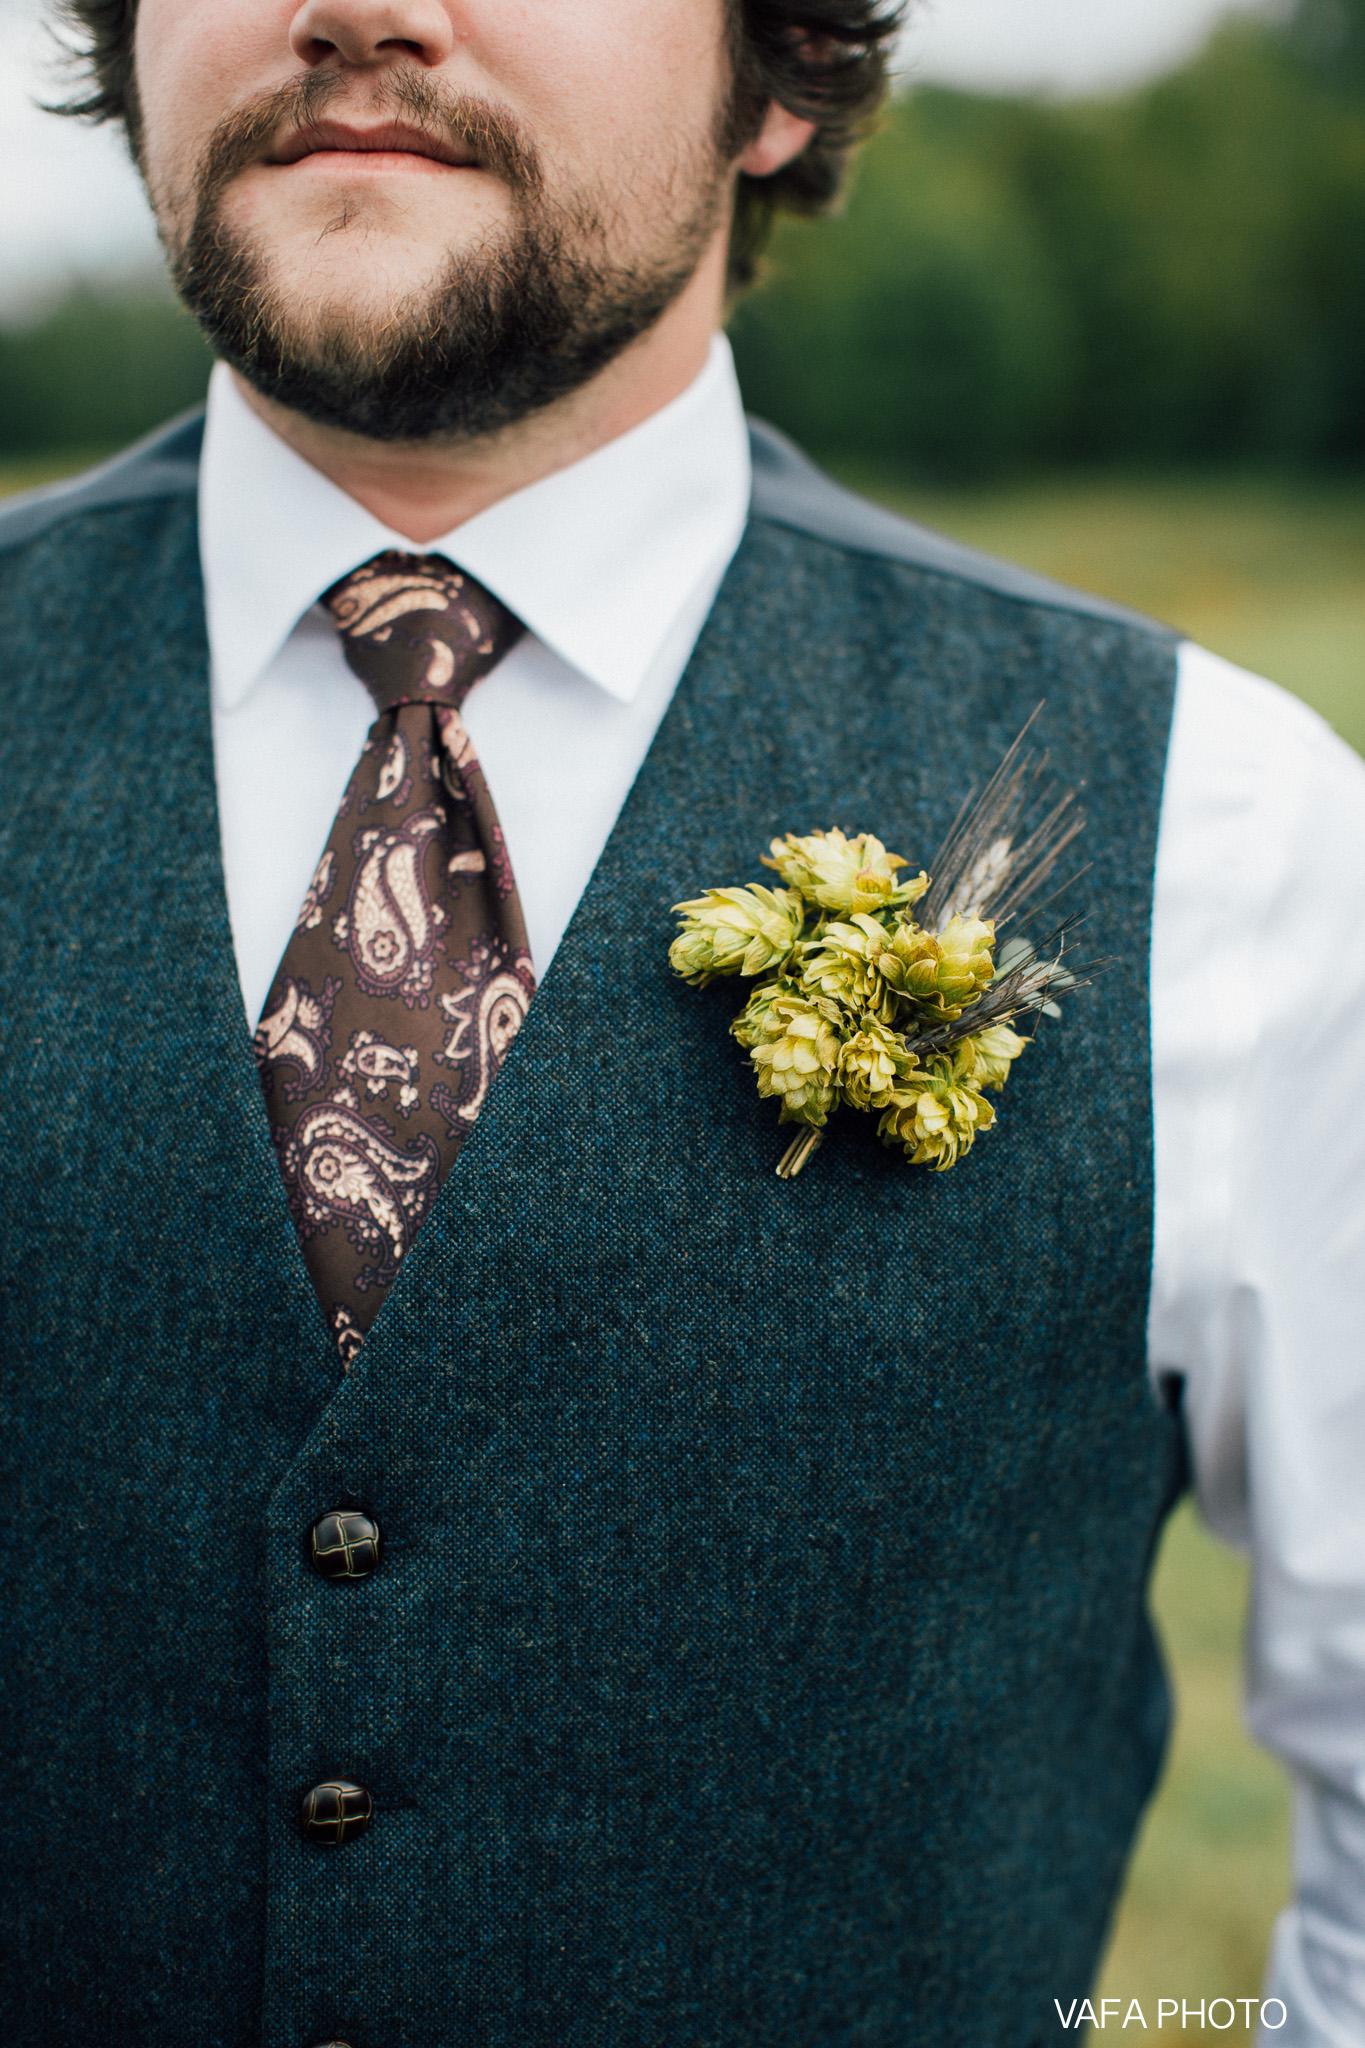 Belsolda-Farm-Wedding-Christy-Eric-Vafa-Photo-265.jpg